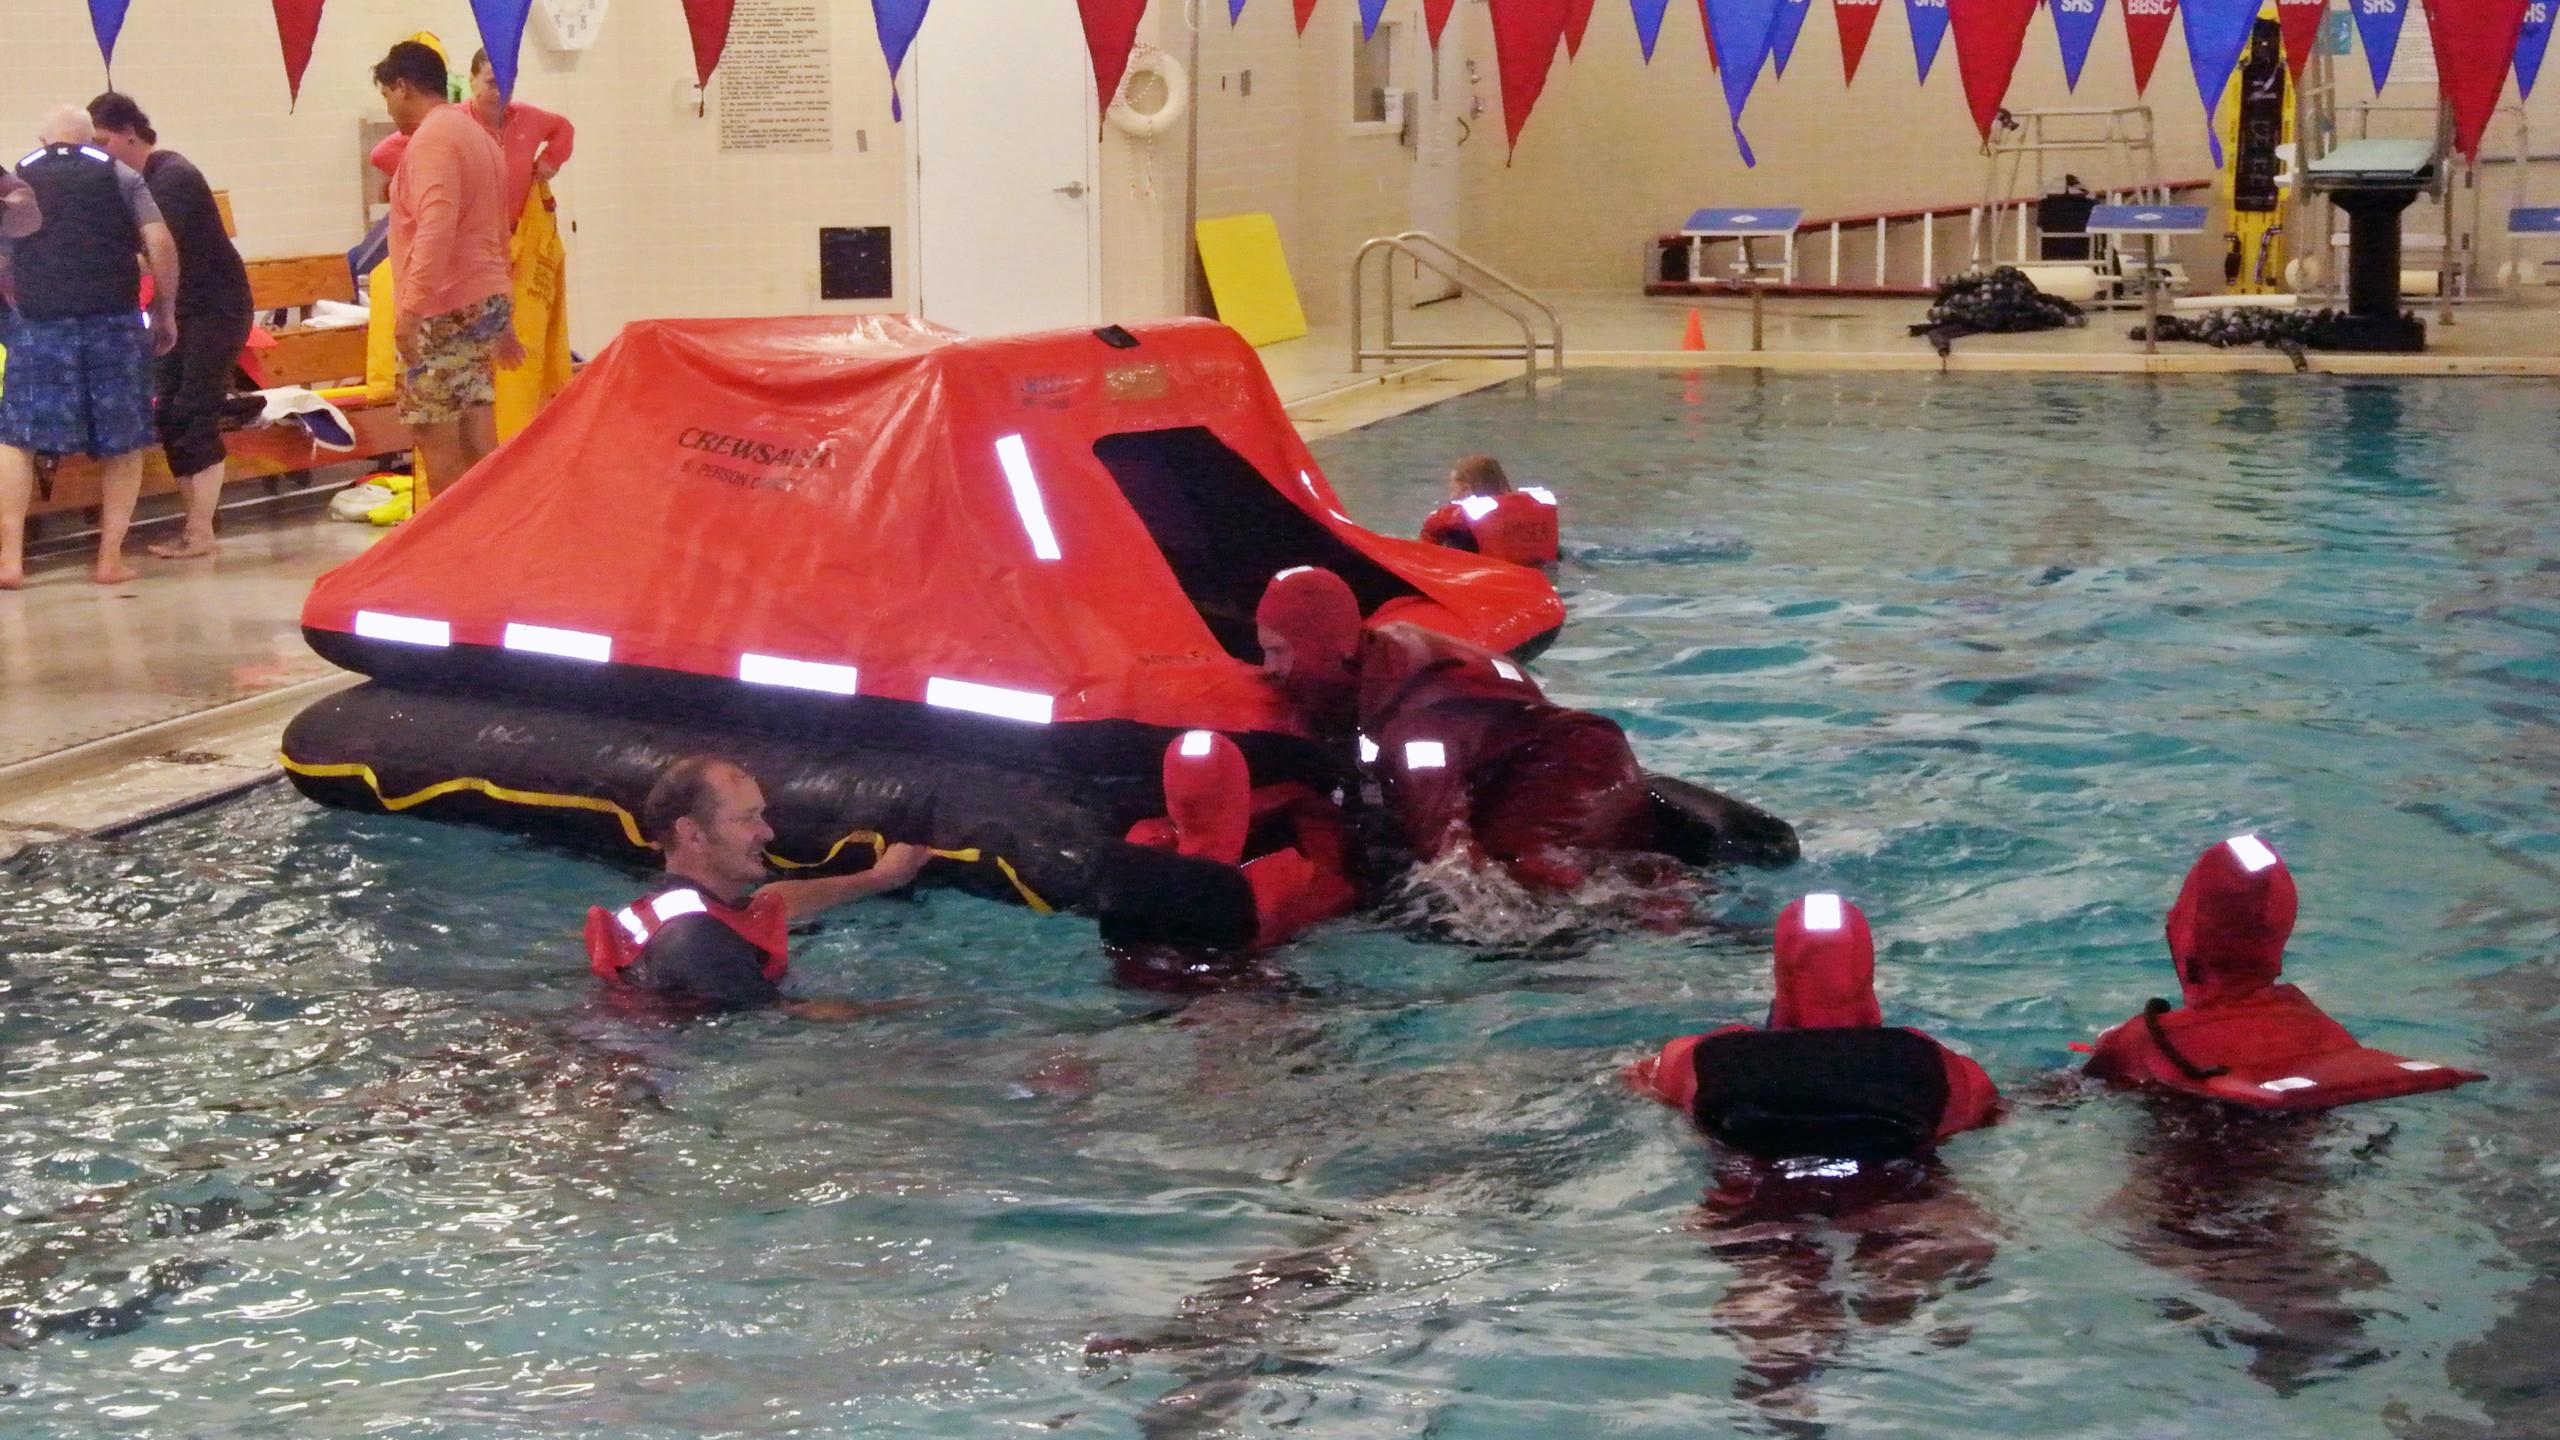 Boarding Life Raft